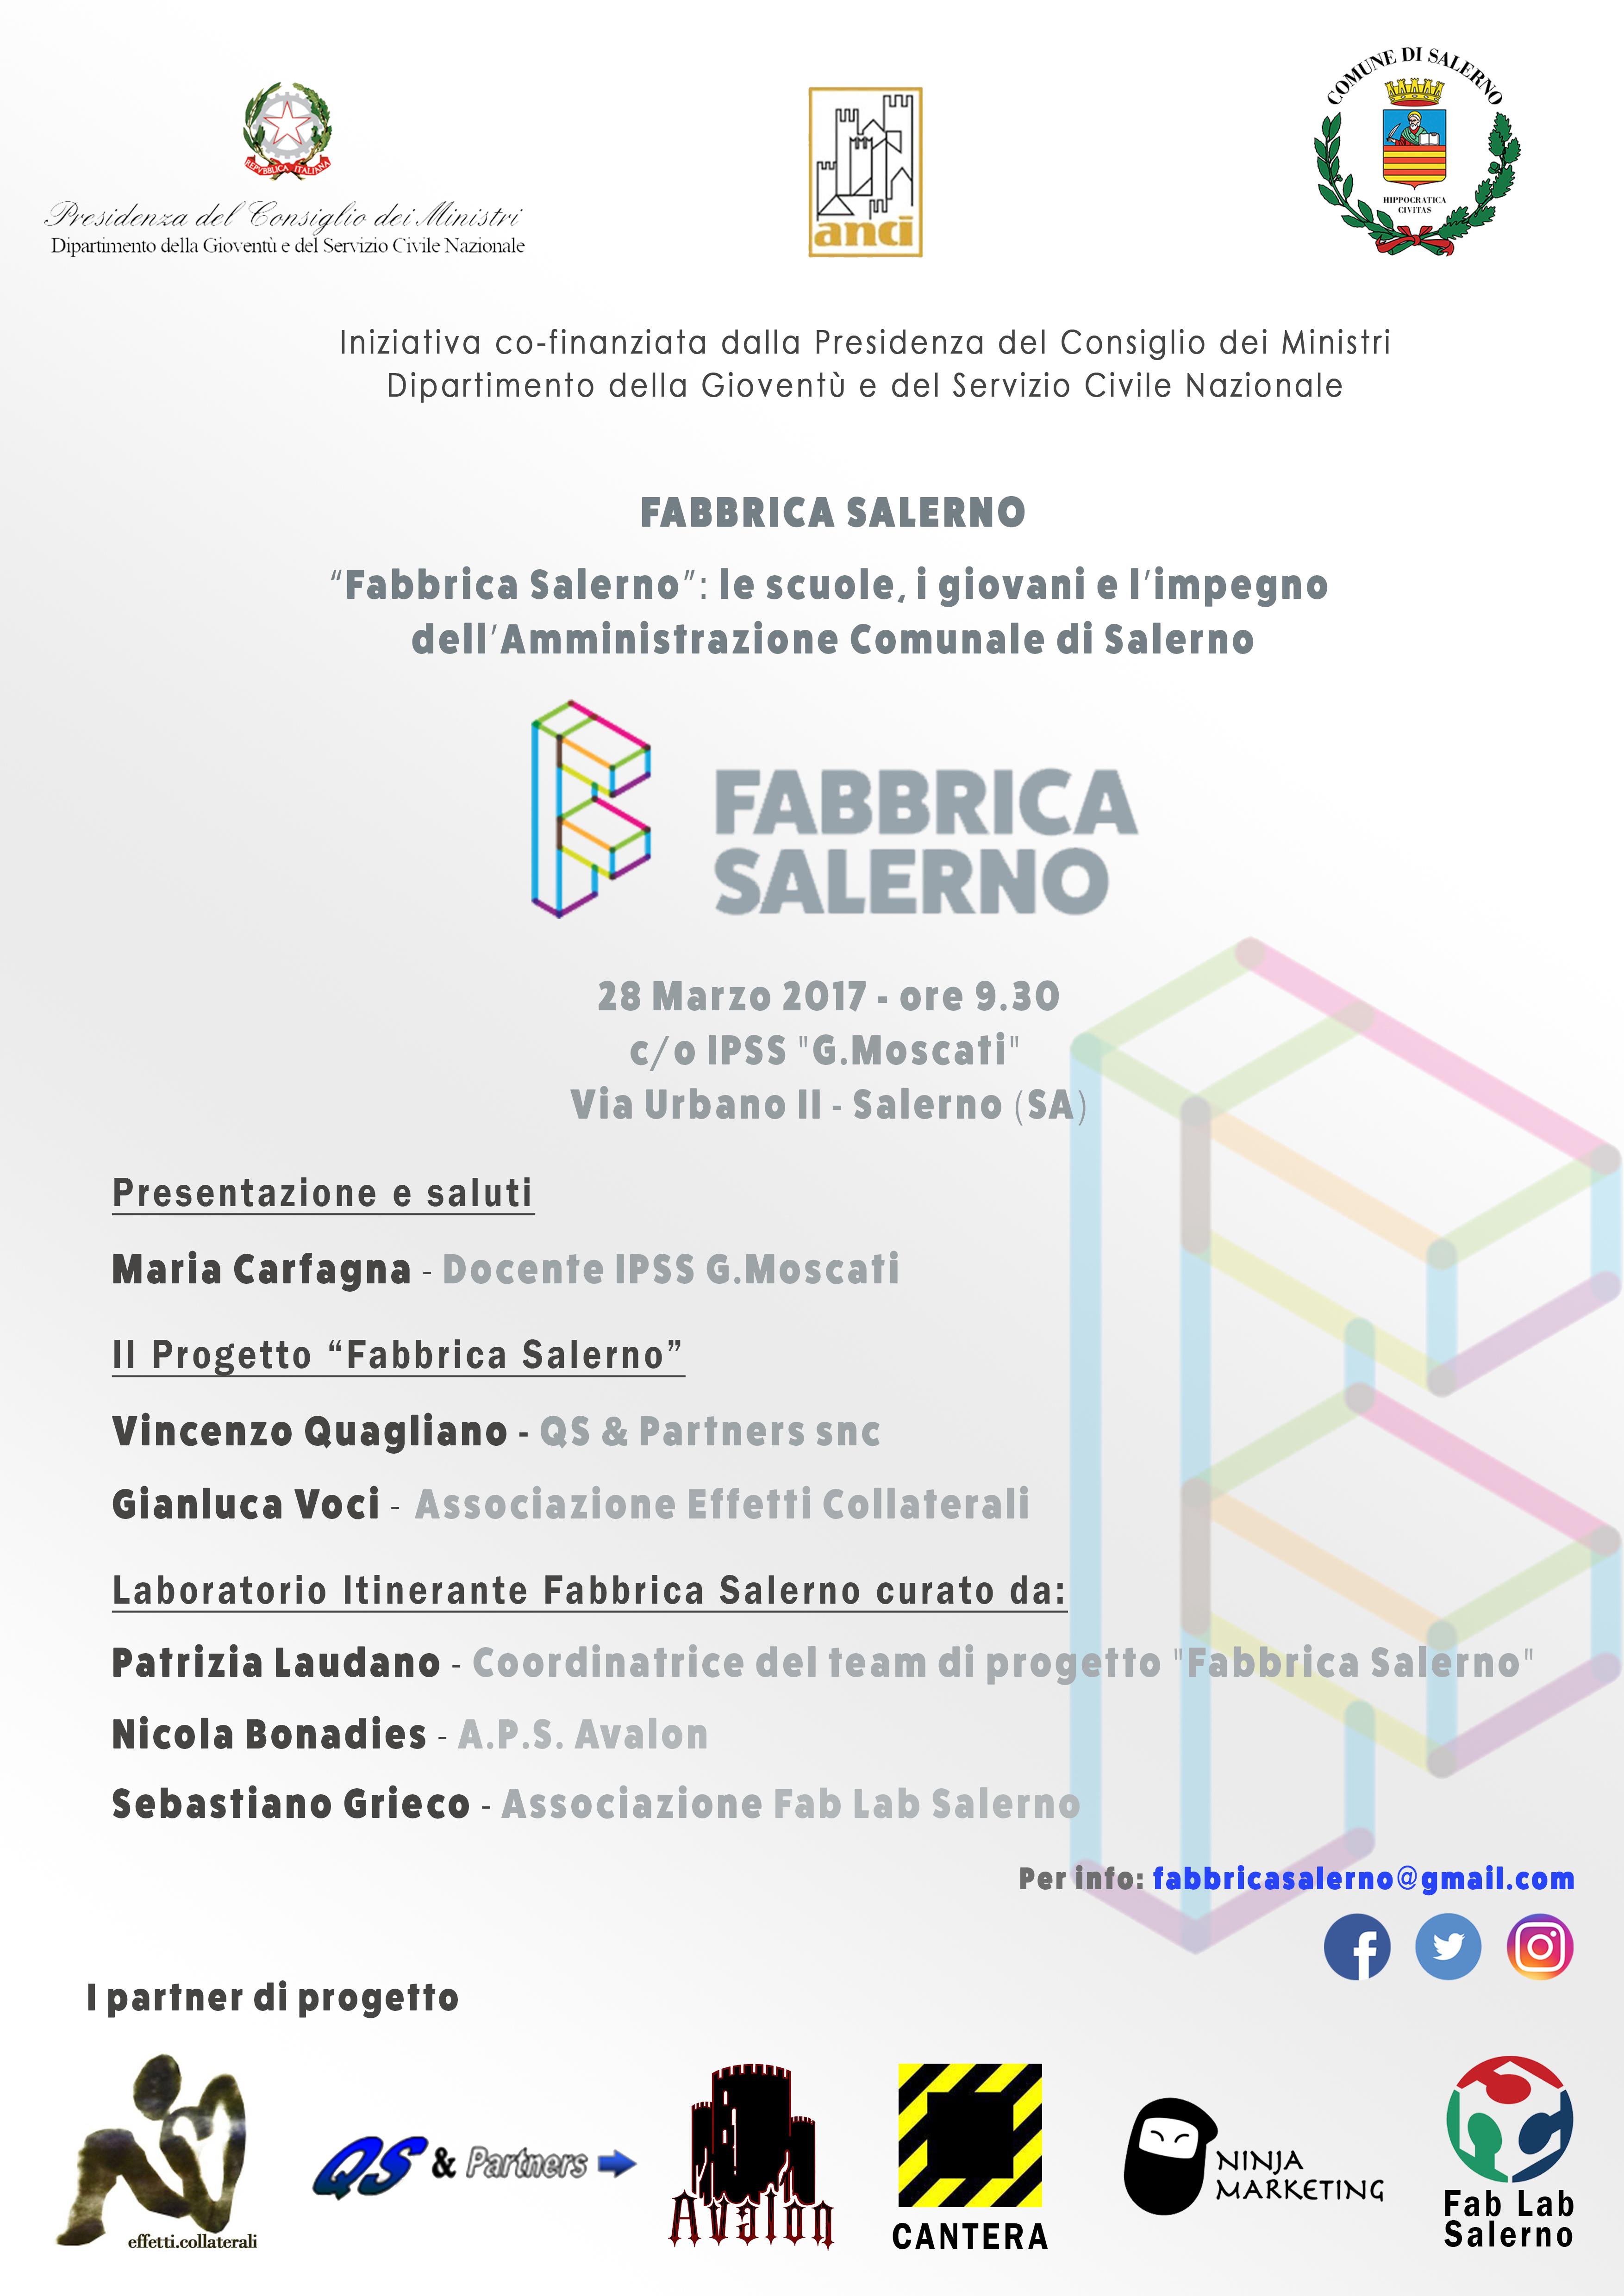 Fabbrica Salerno-Moscati